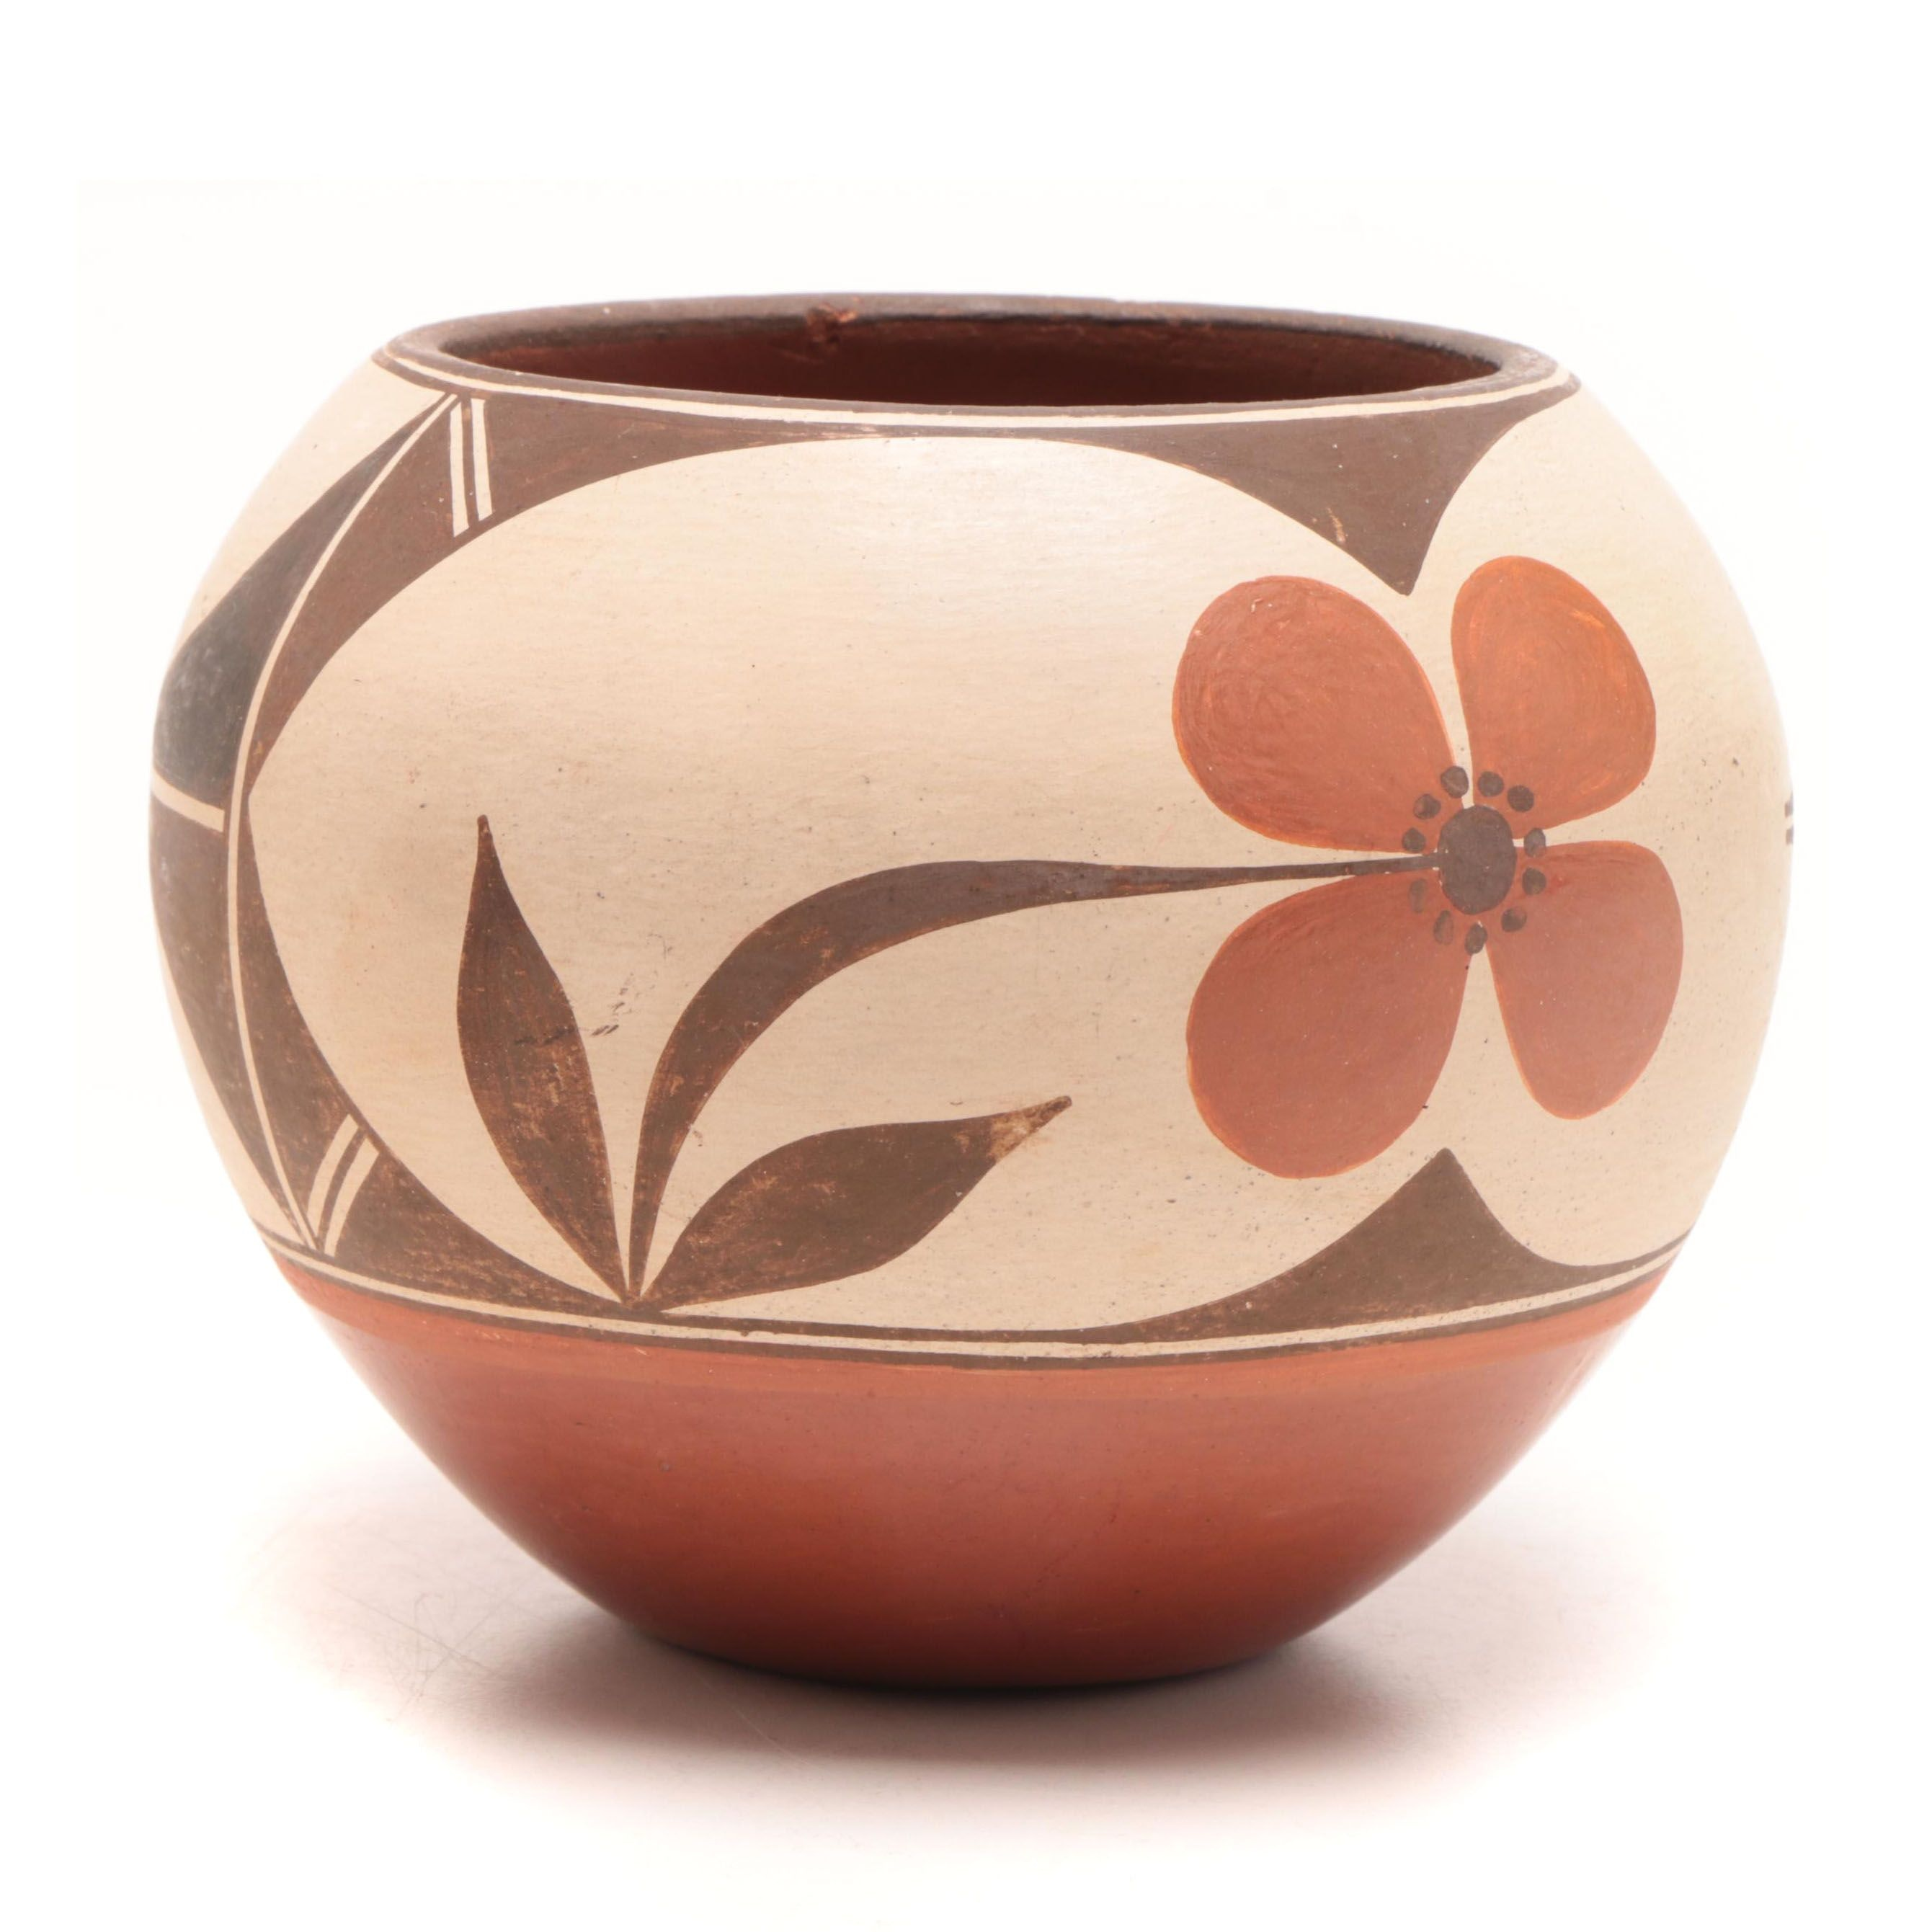 Pueblo Pottery Vase, Artist Signed